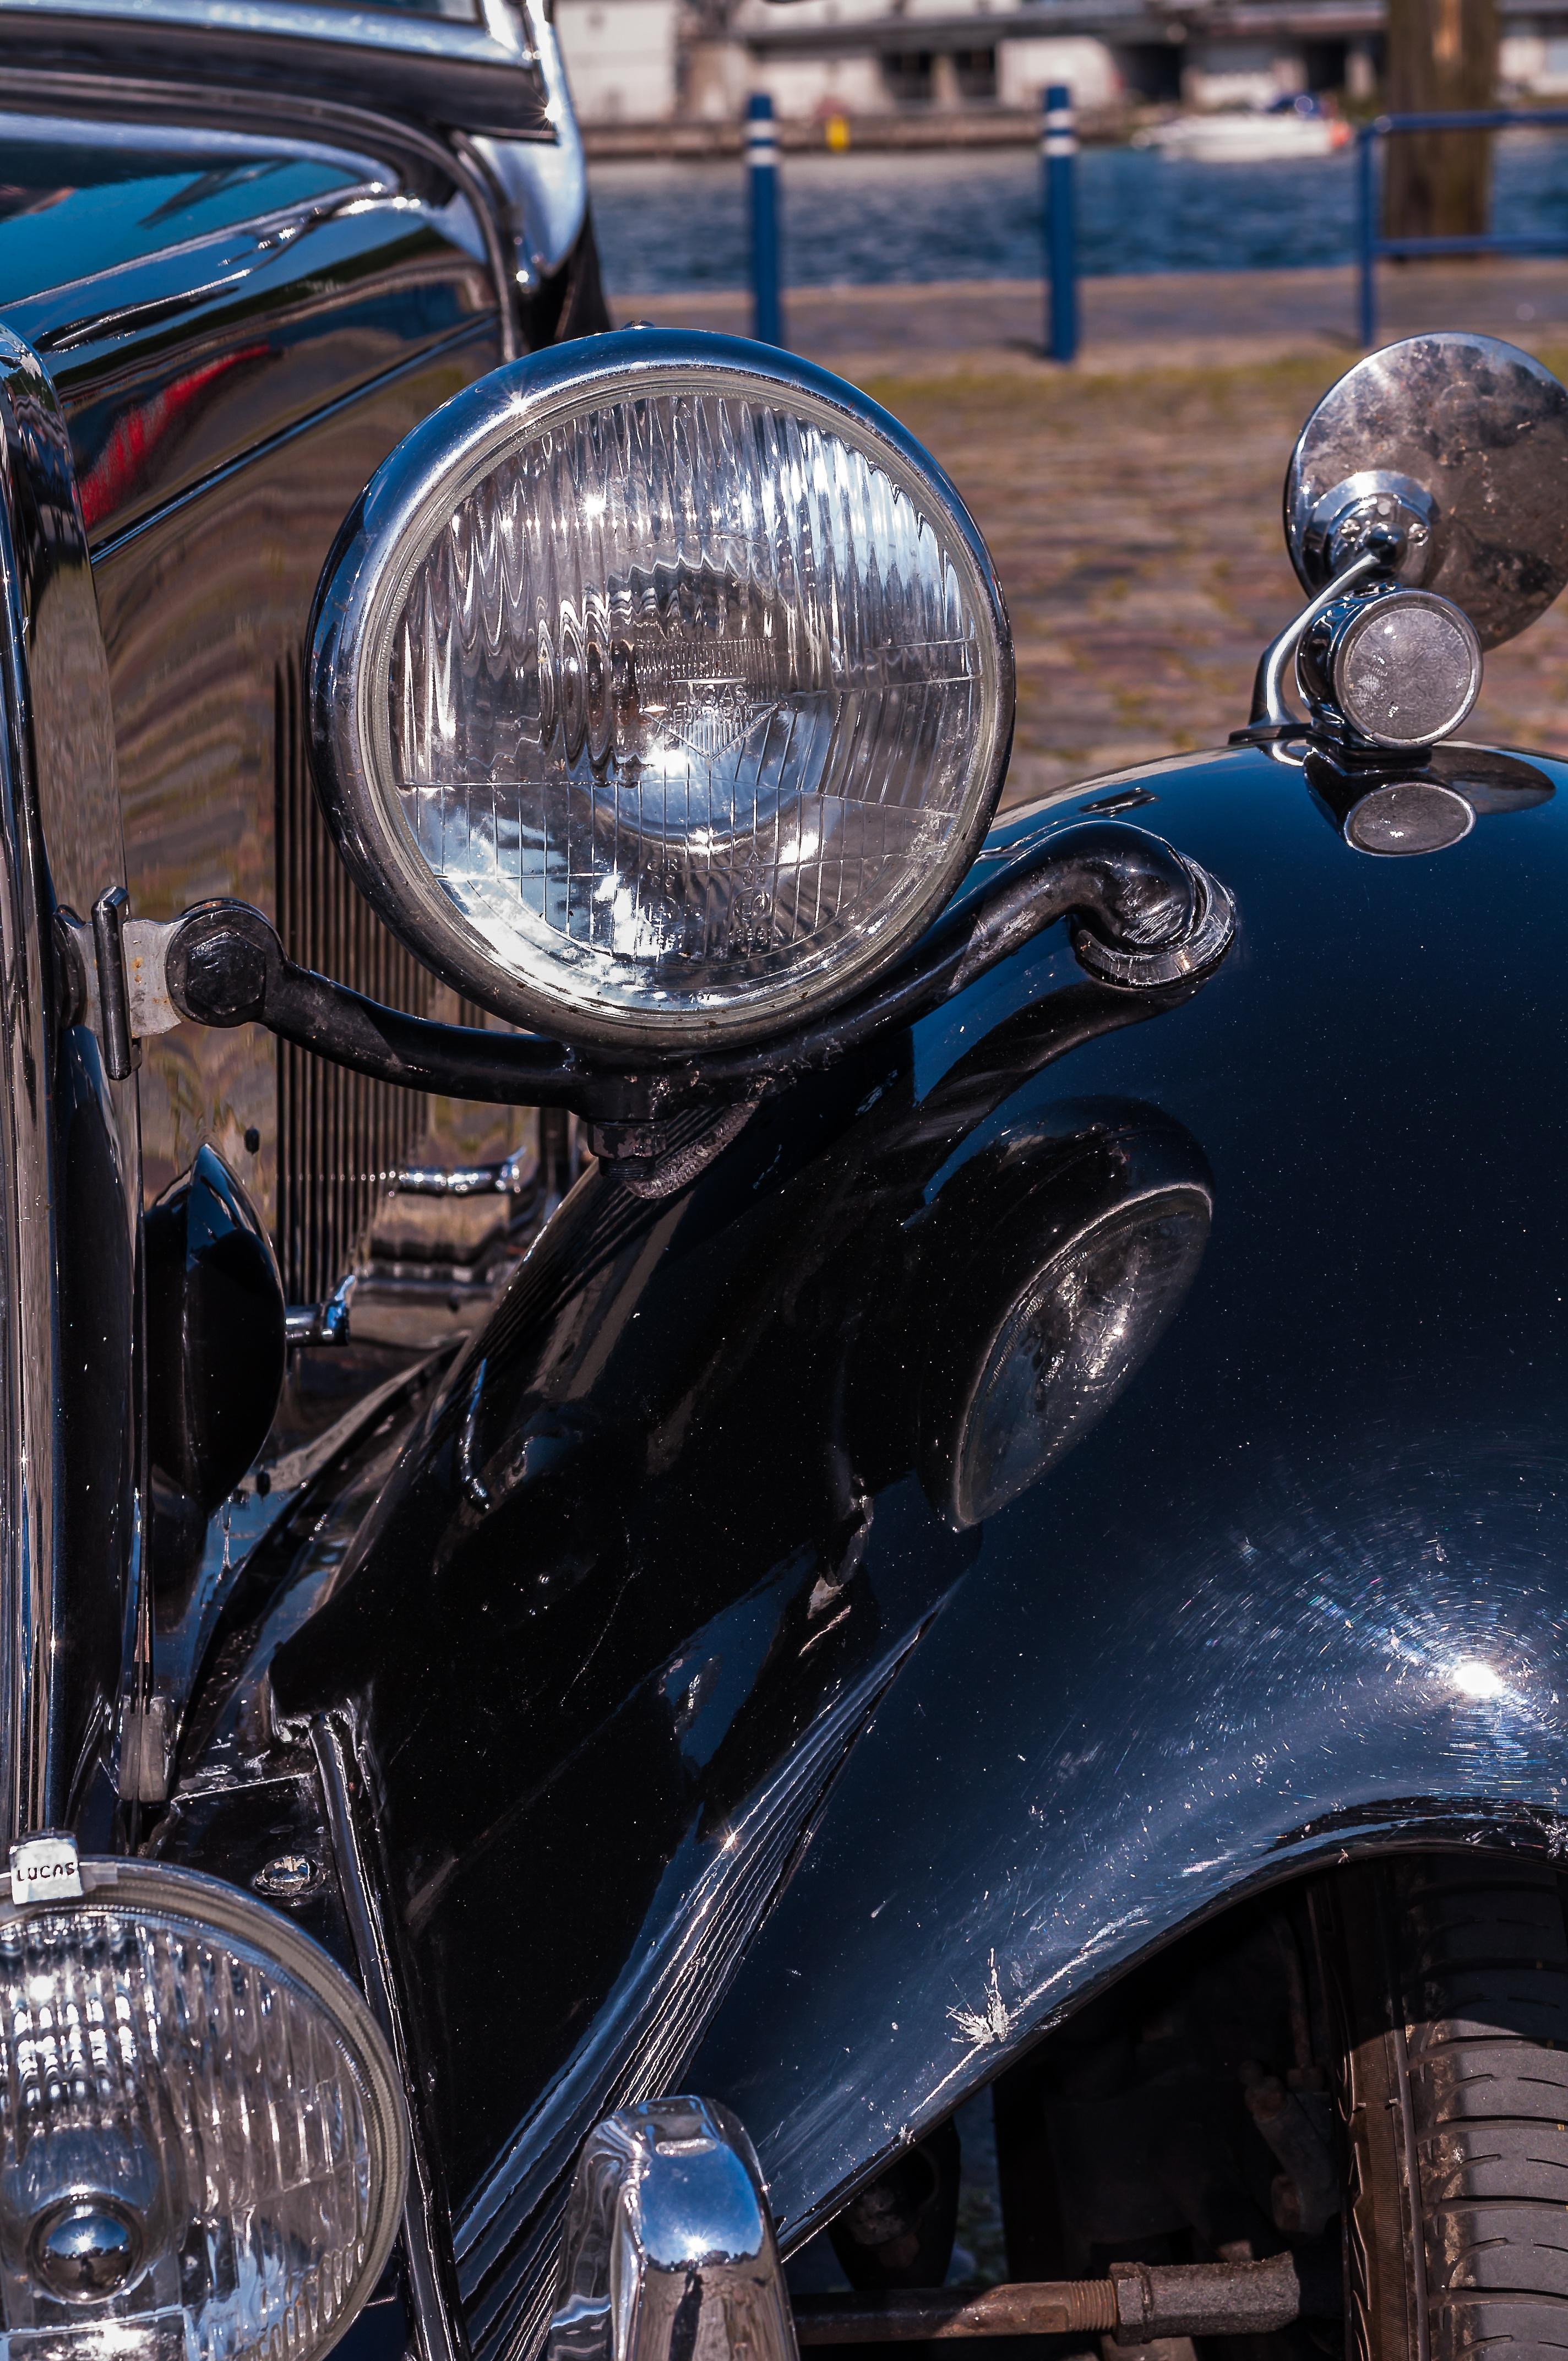 Free Images  Retro, Window, Glass, Motorcycle, Auto -3246